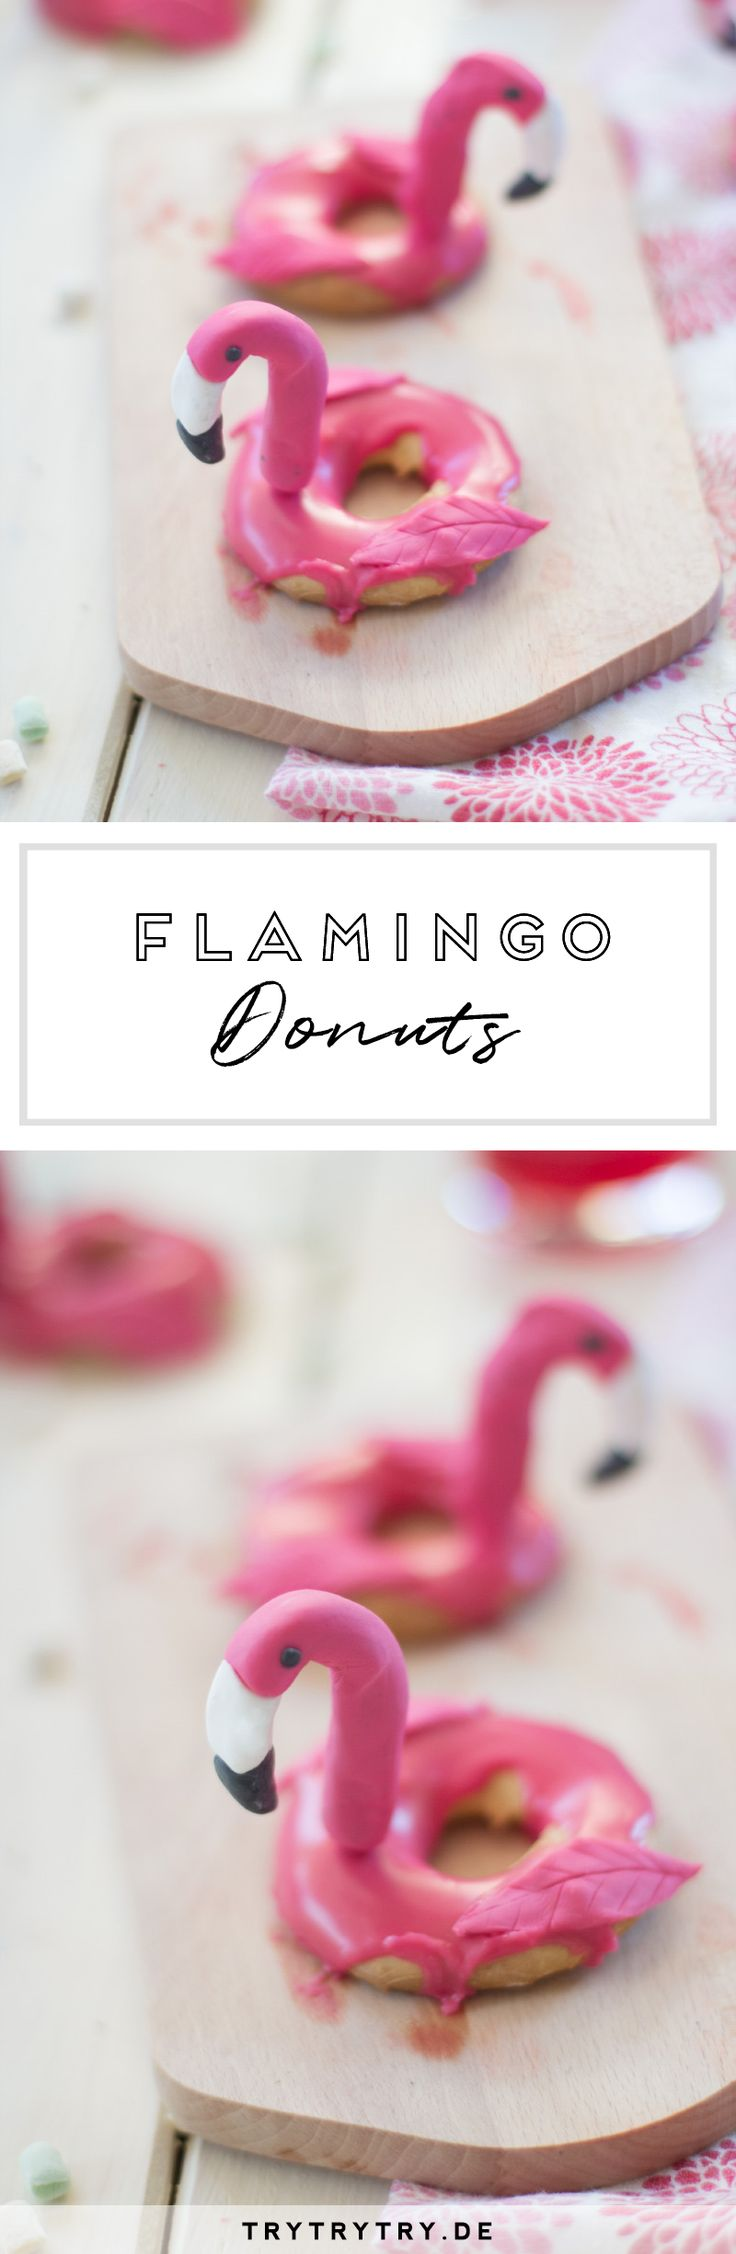 Fast zu süß zum Essen: Flamingo Donuts